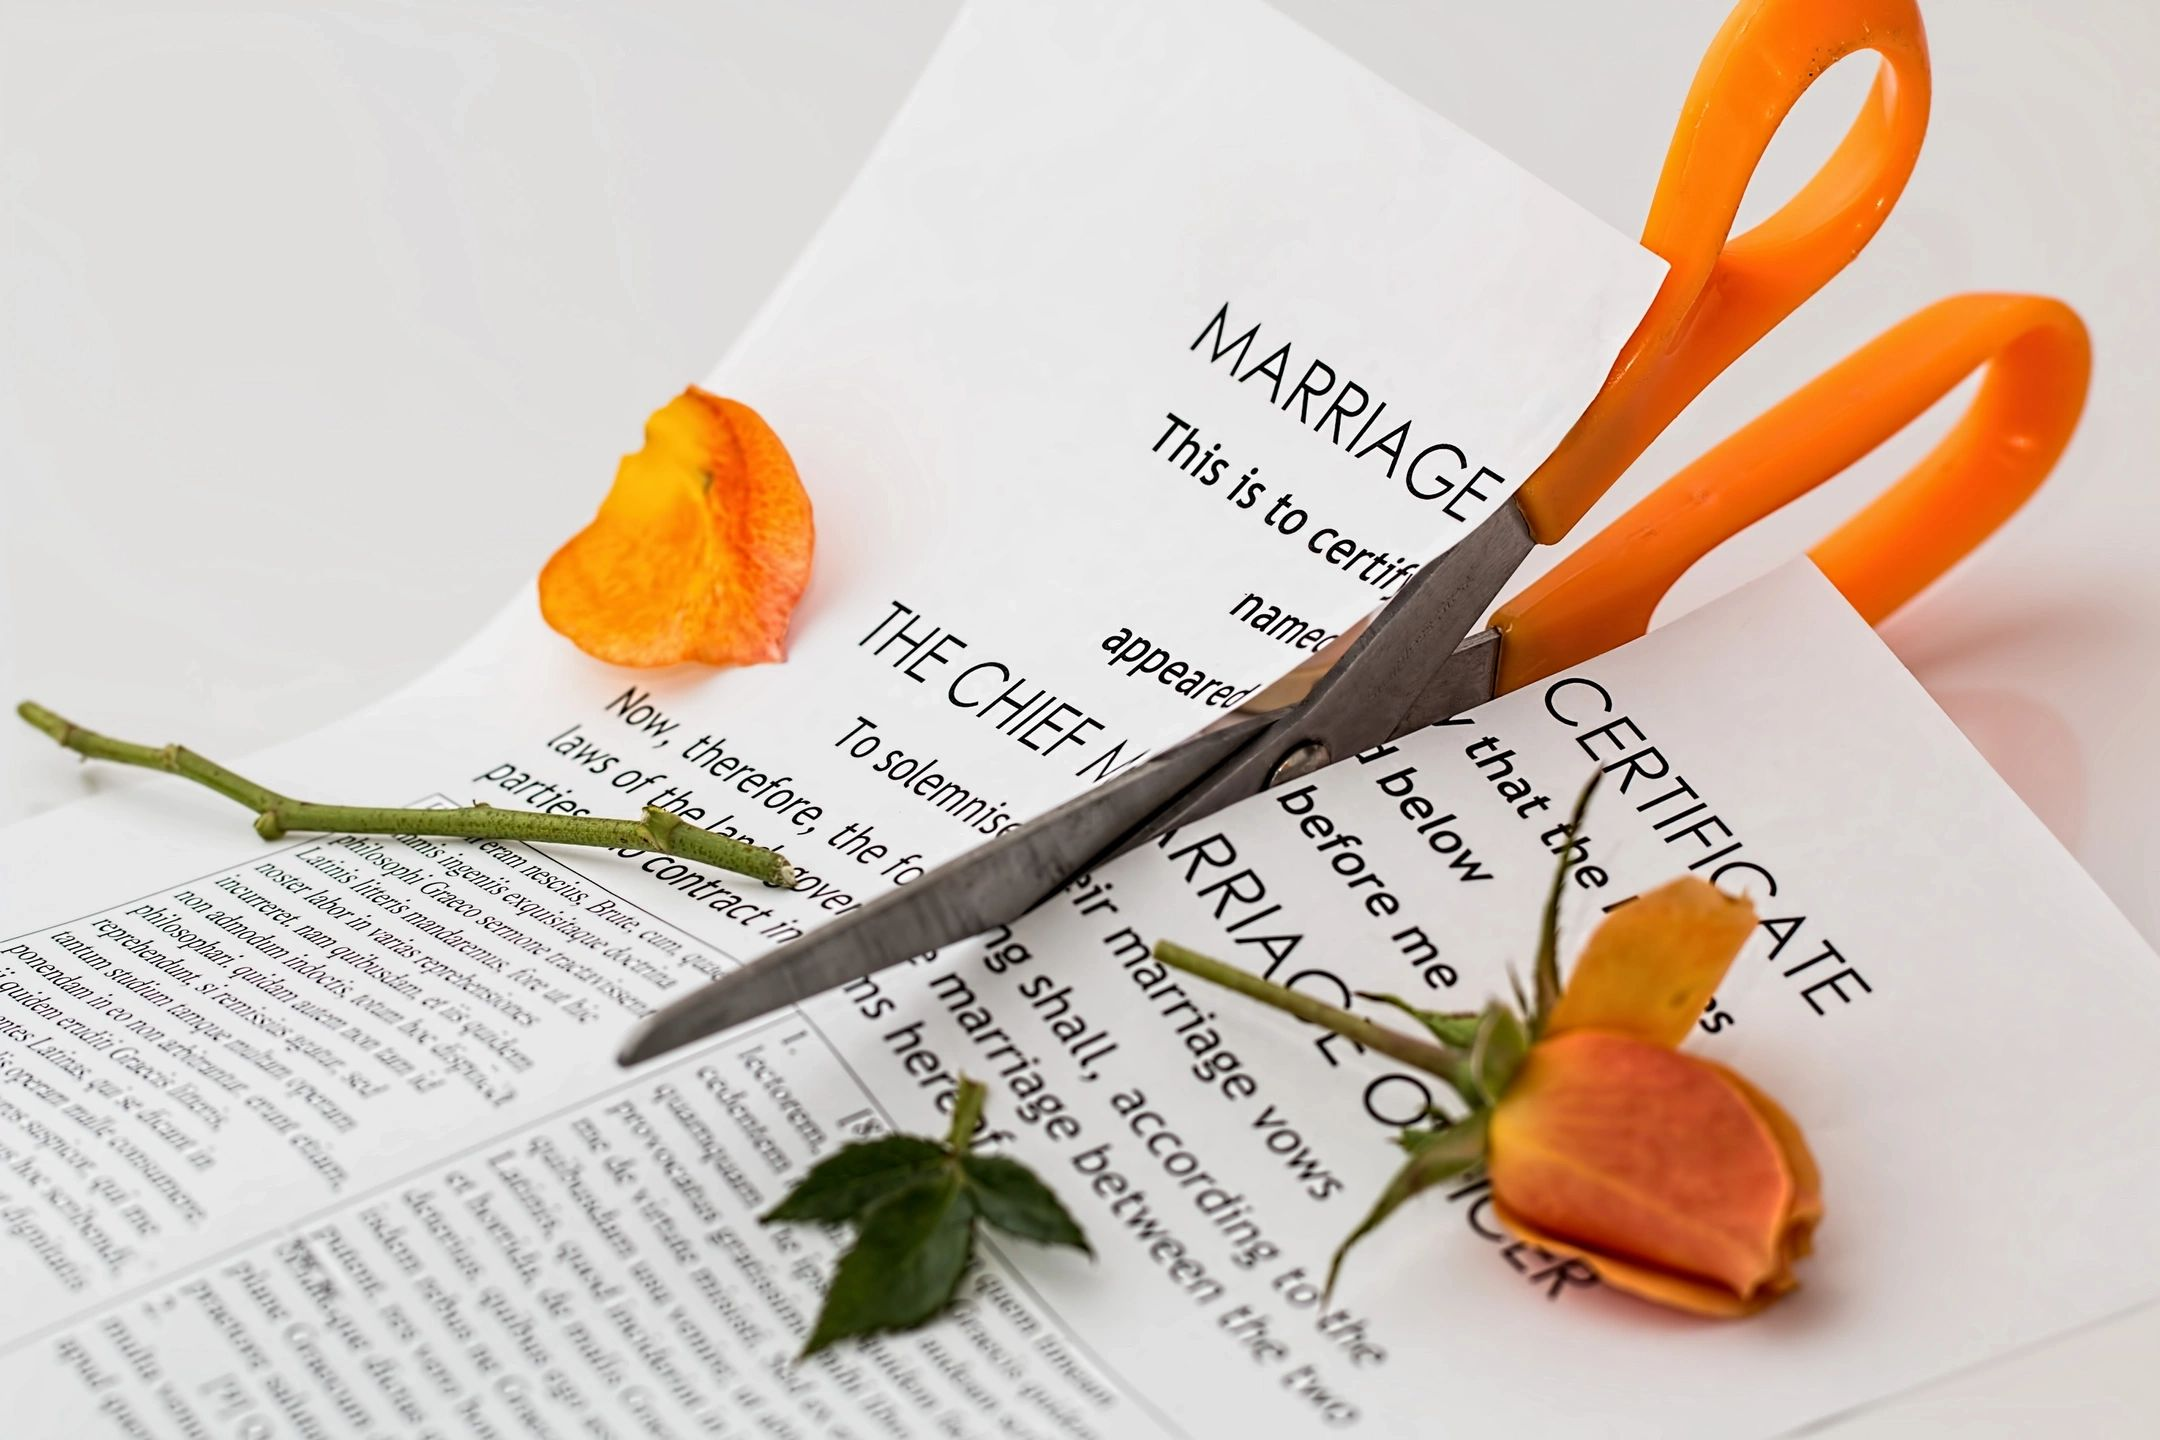 Marriage certificate being cut in half